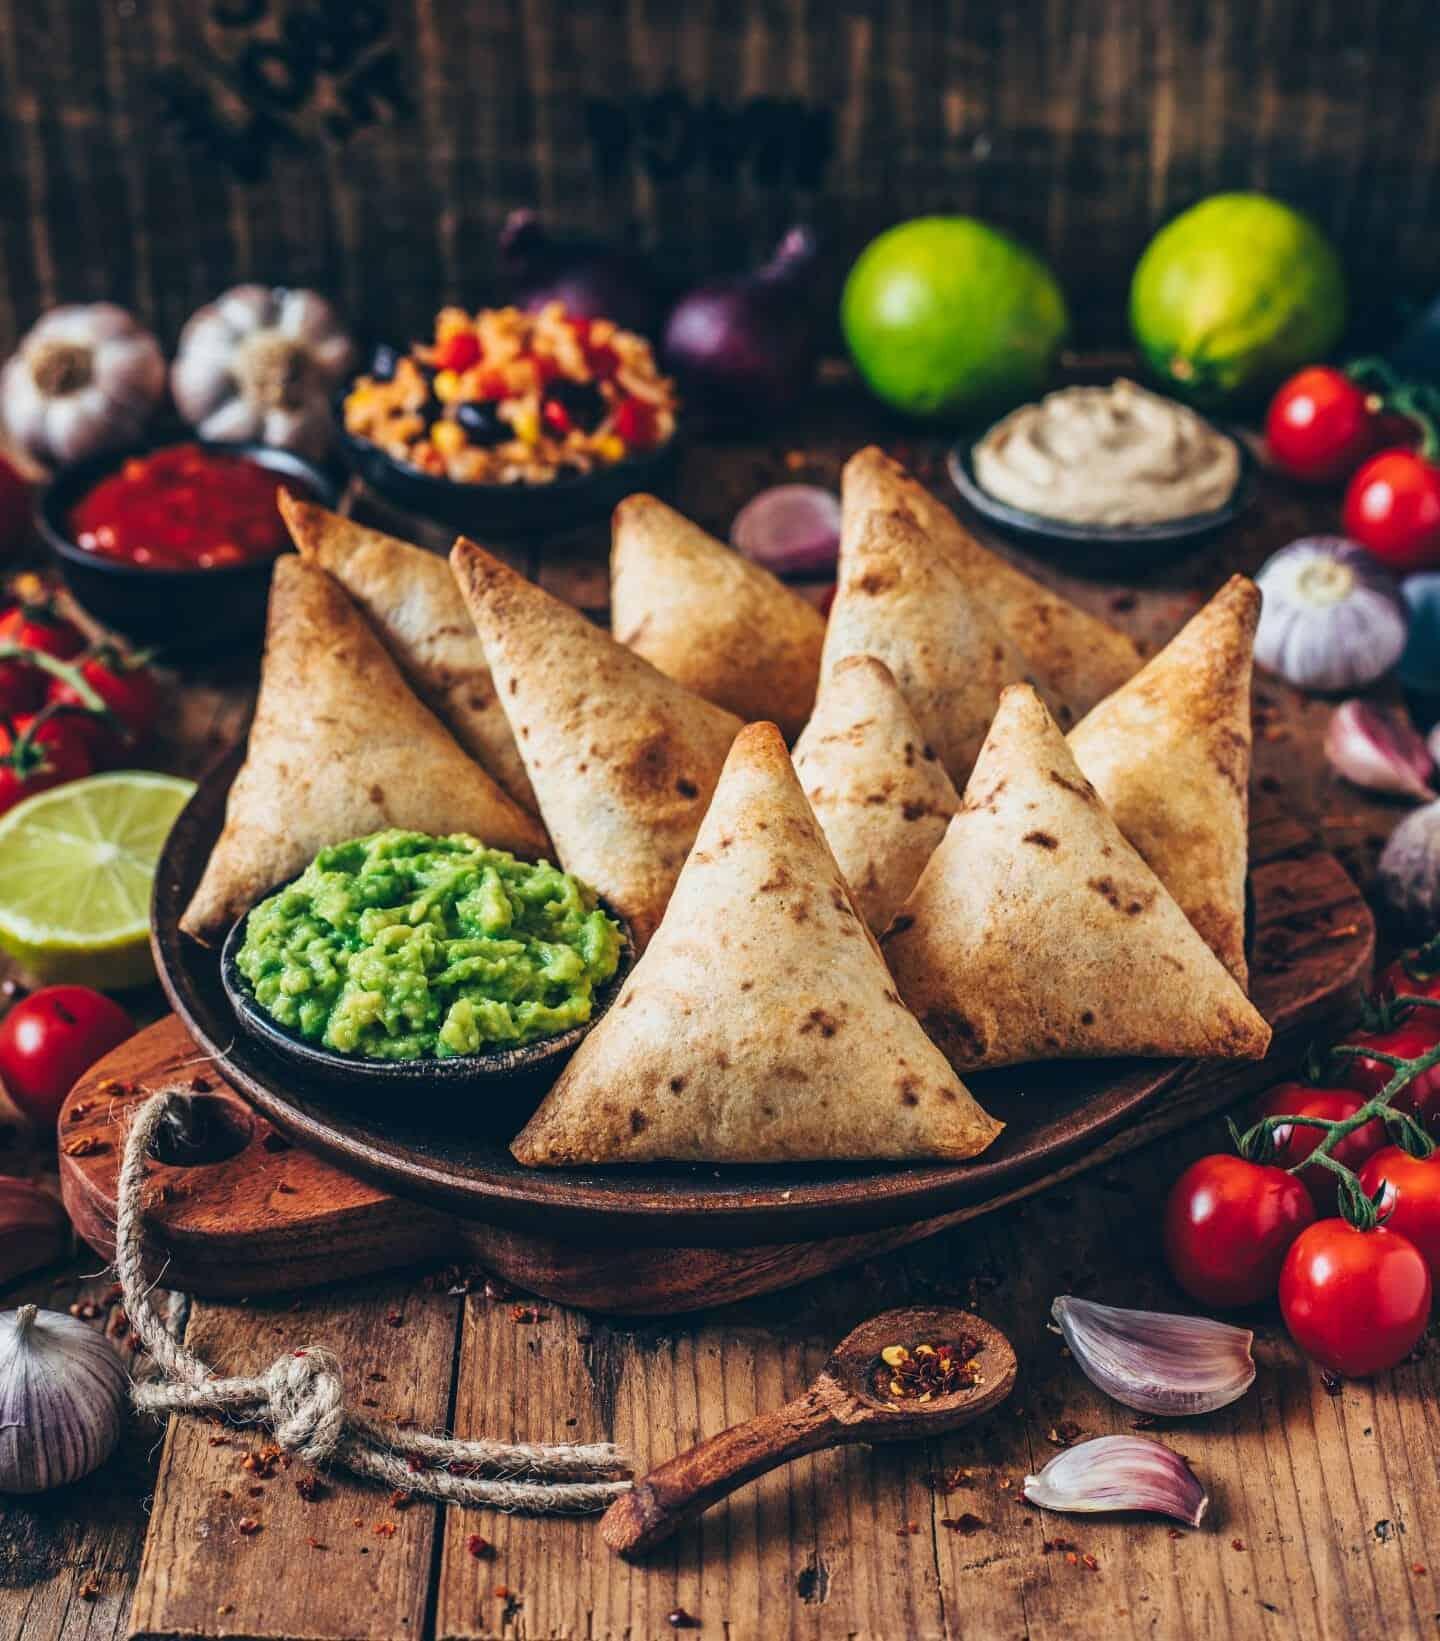 vegan burrito samosas with guacamole